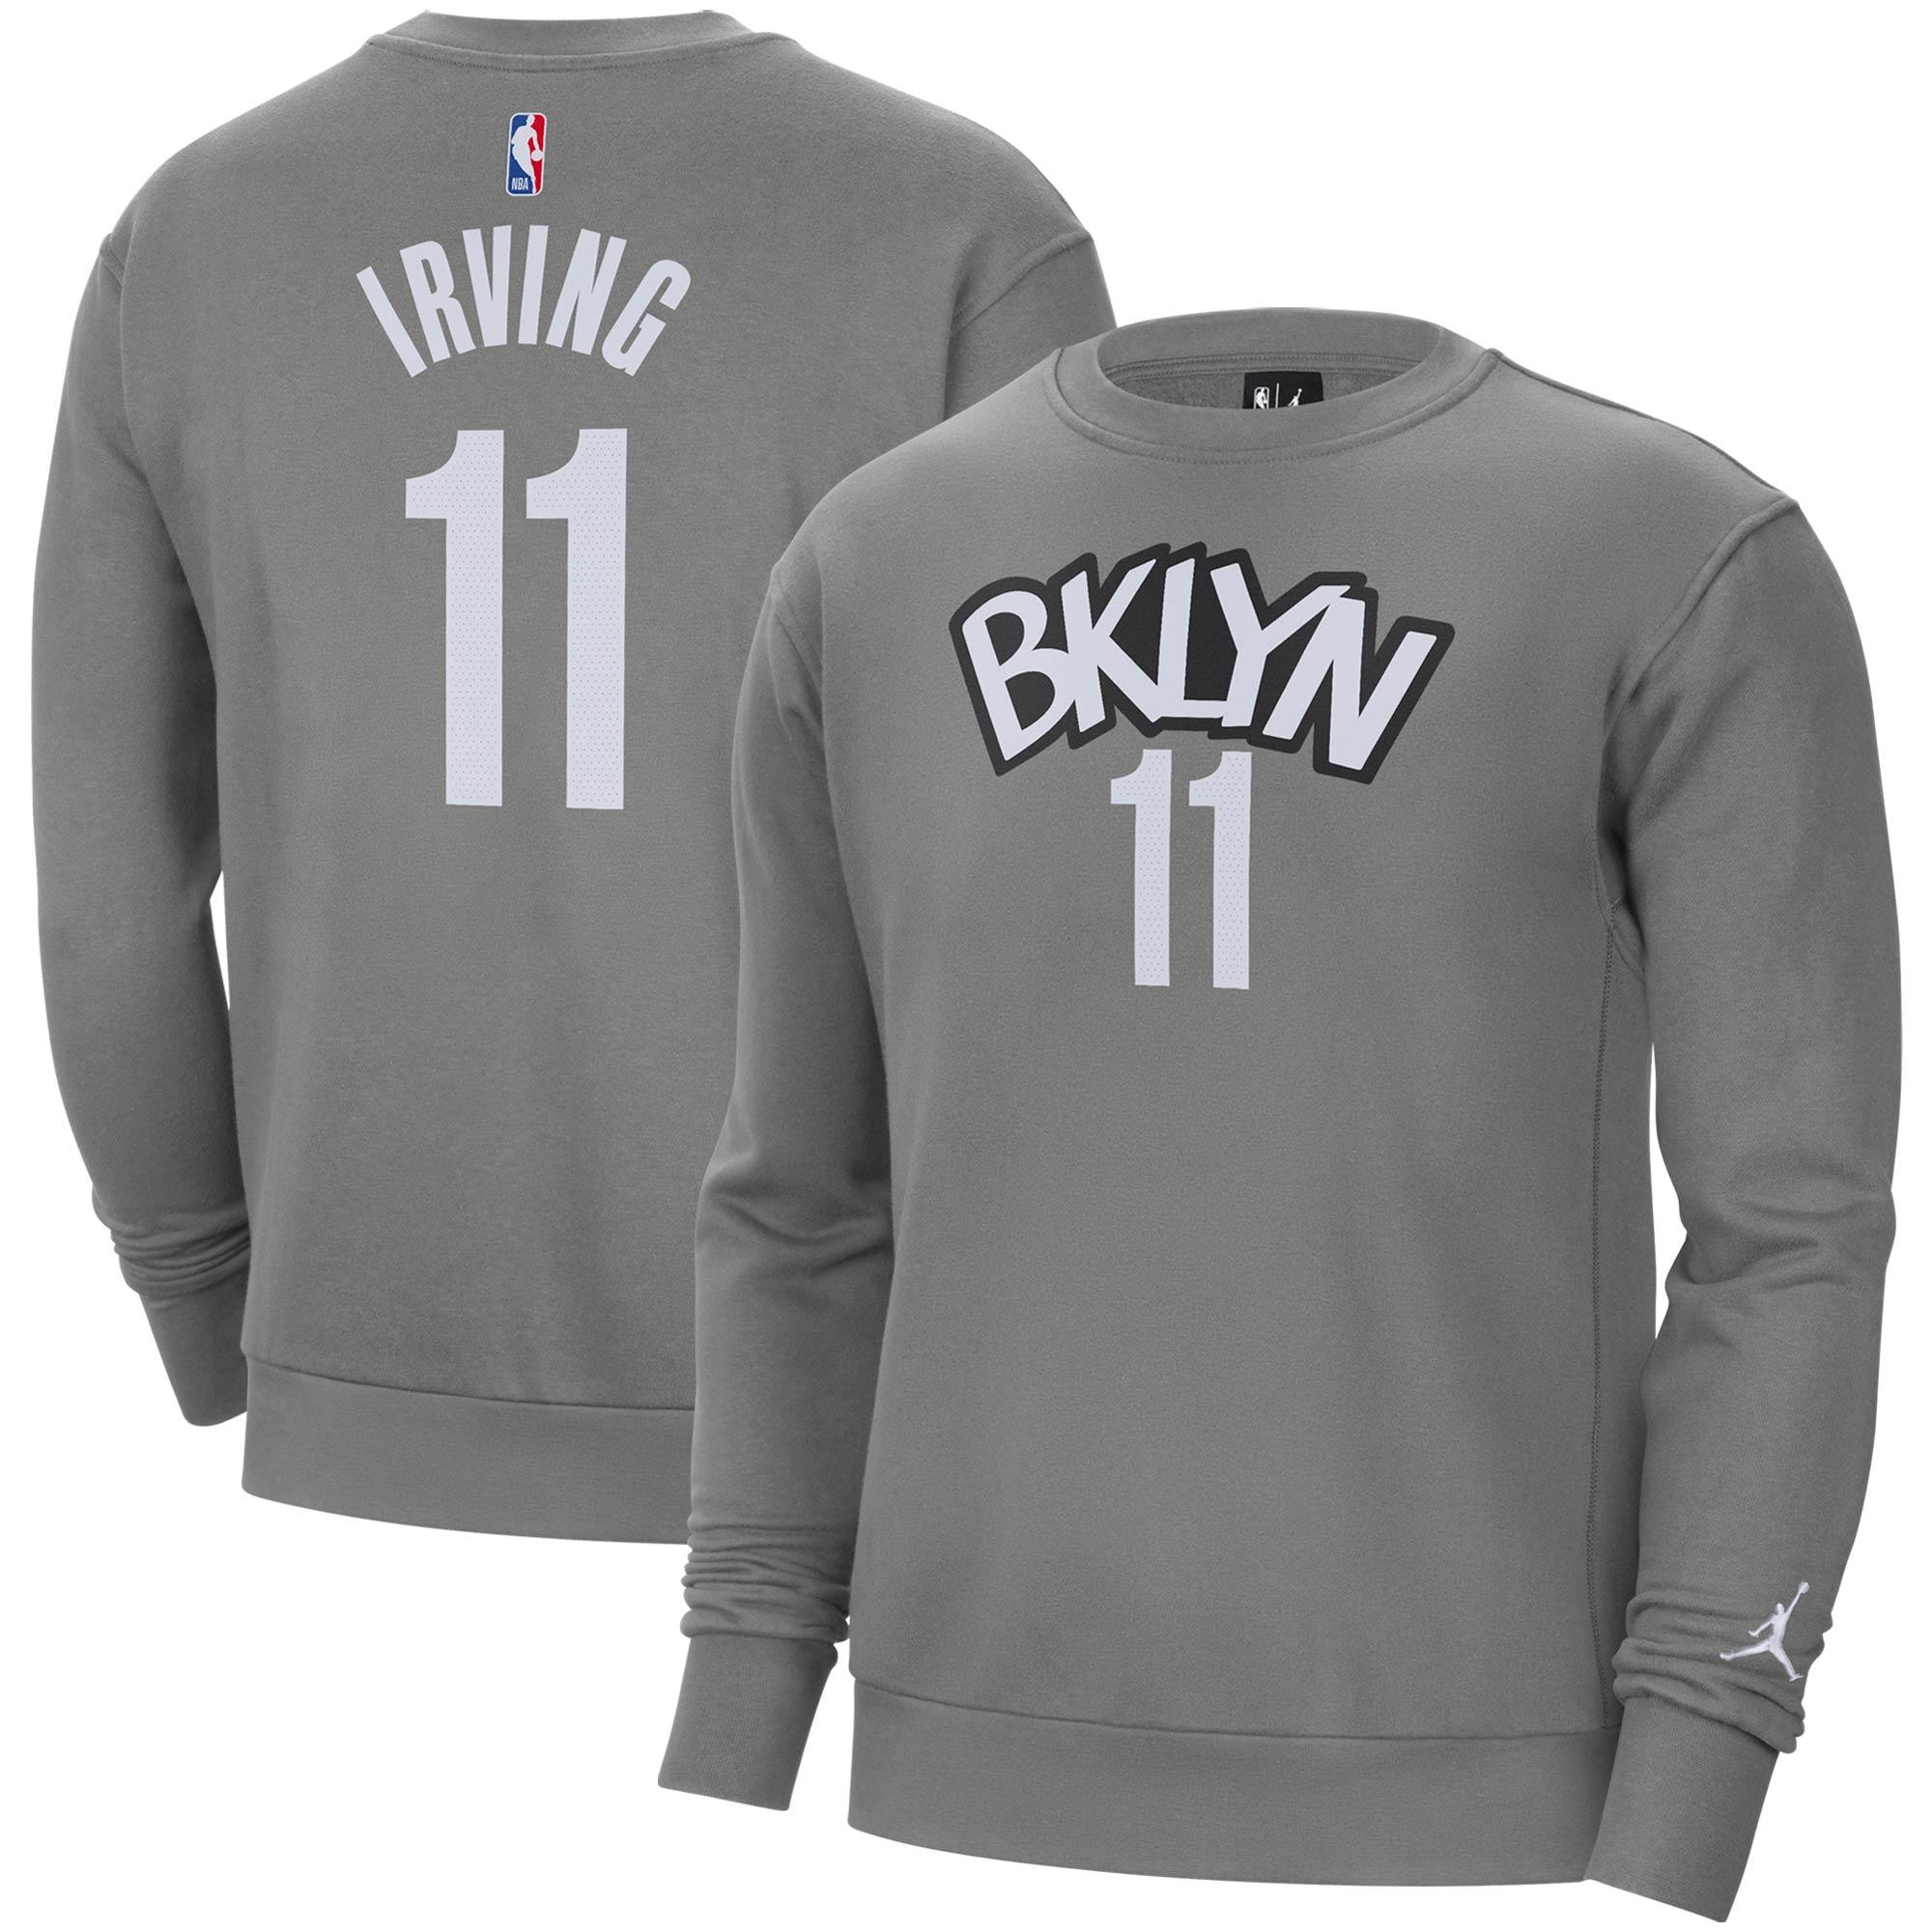 Kyrie Irving Brooklyn Nets Jordan Brand Name & Number Fleece Crew Sweatshirt - Gray